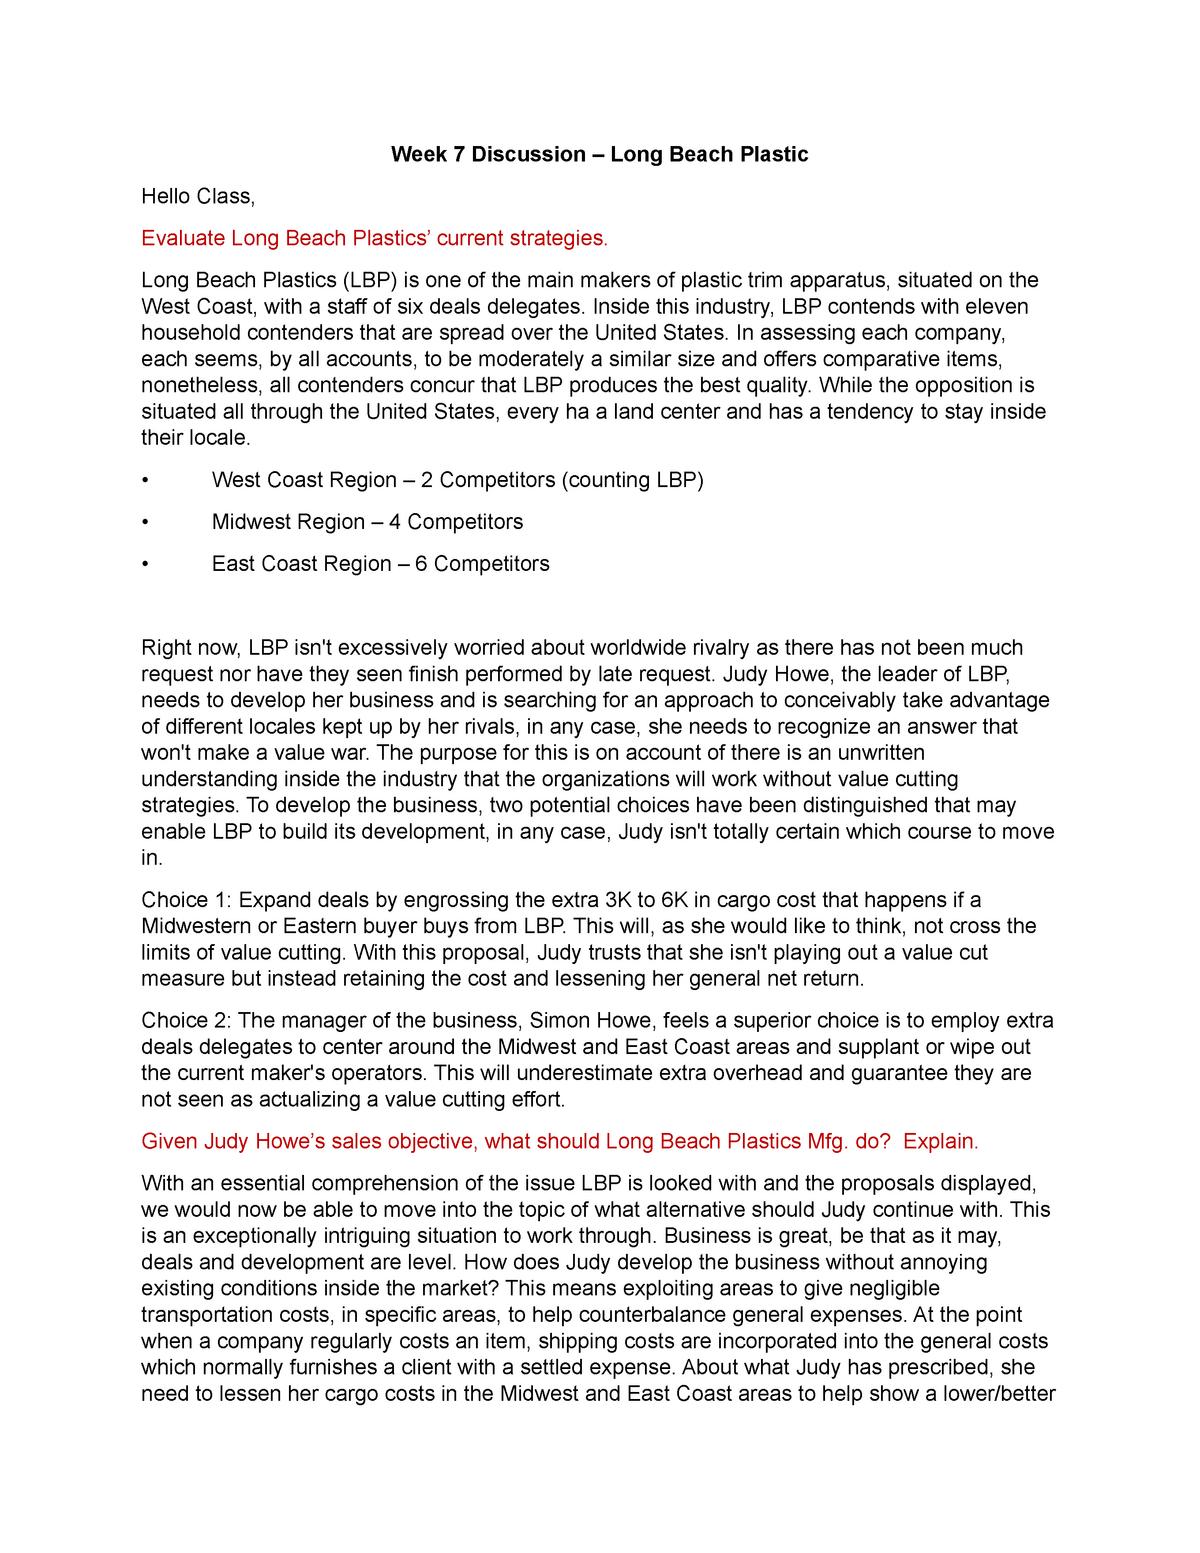 Mk351 unit 7 discussion - MK 351: Principles Of Marketing - StuDocu